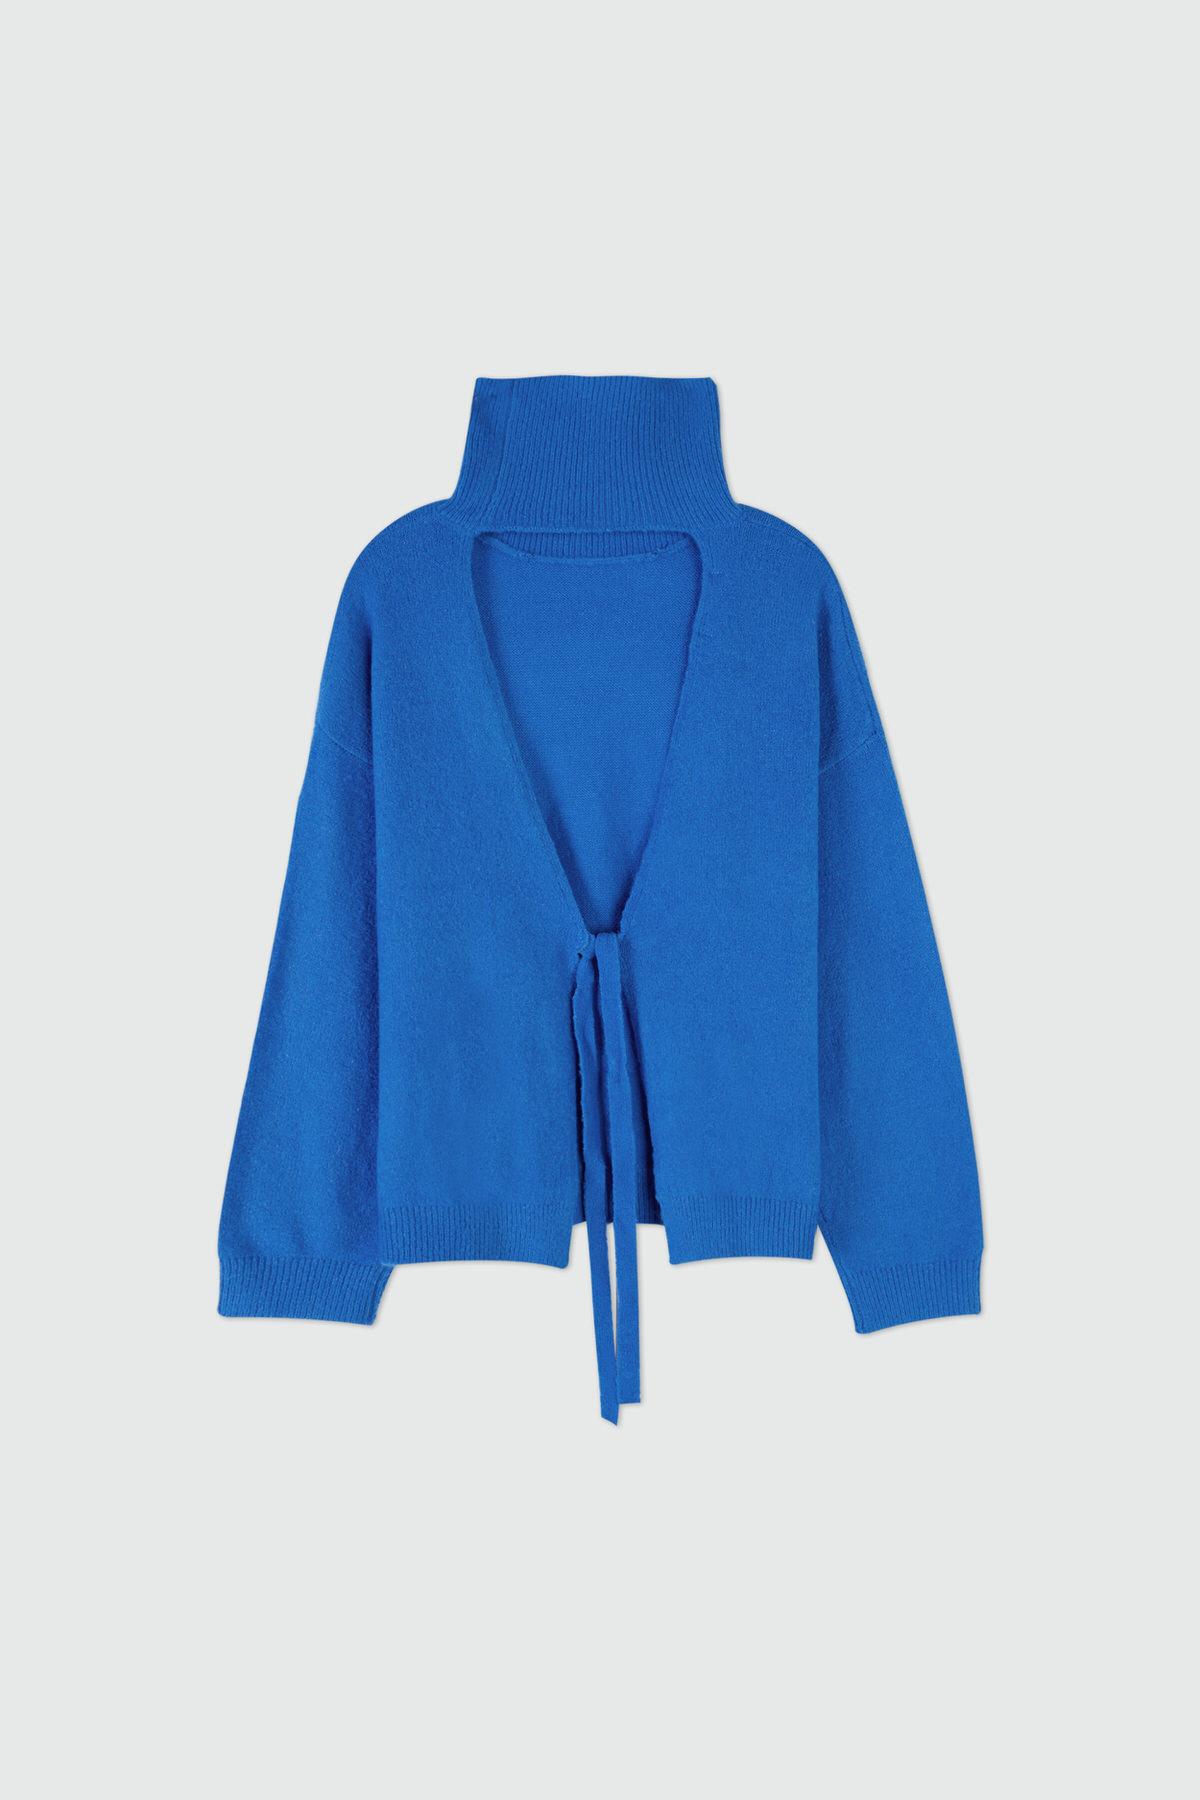 Sweater 2619 Blue 6